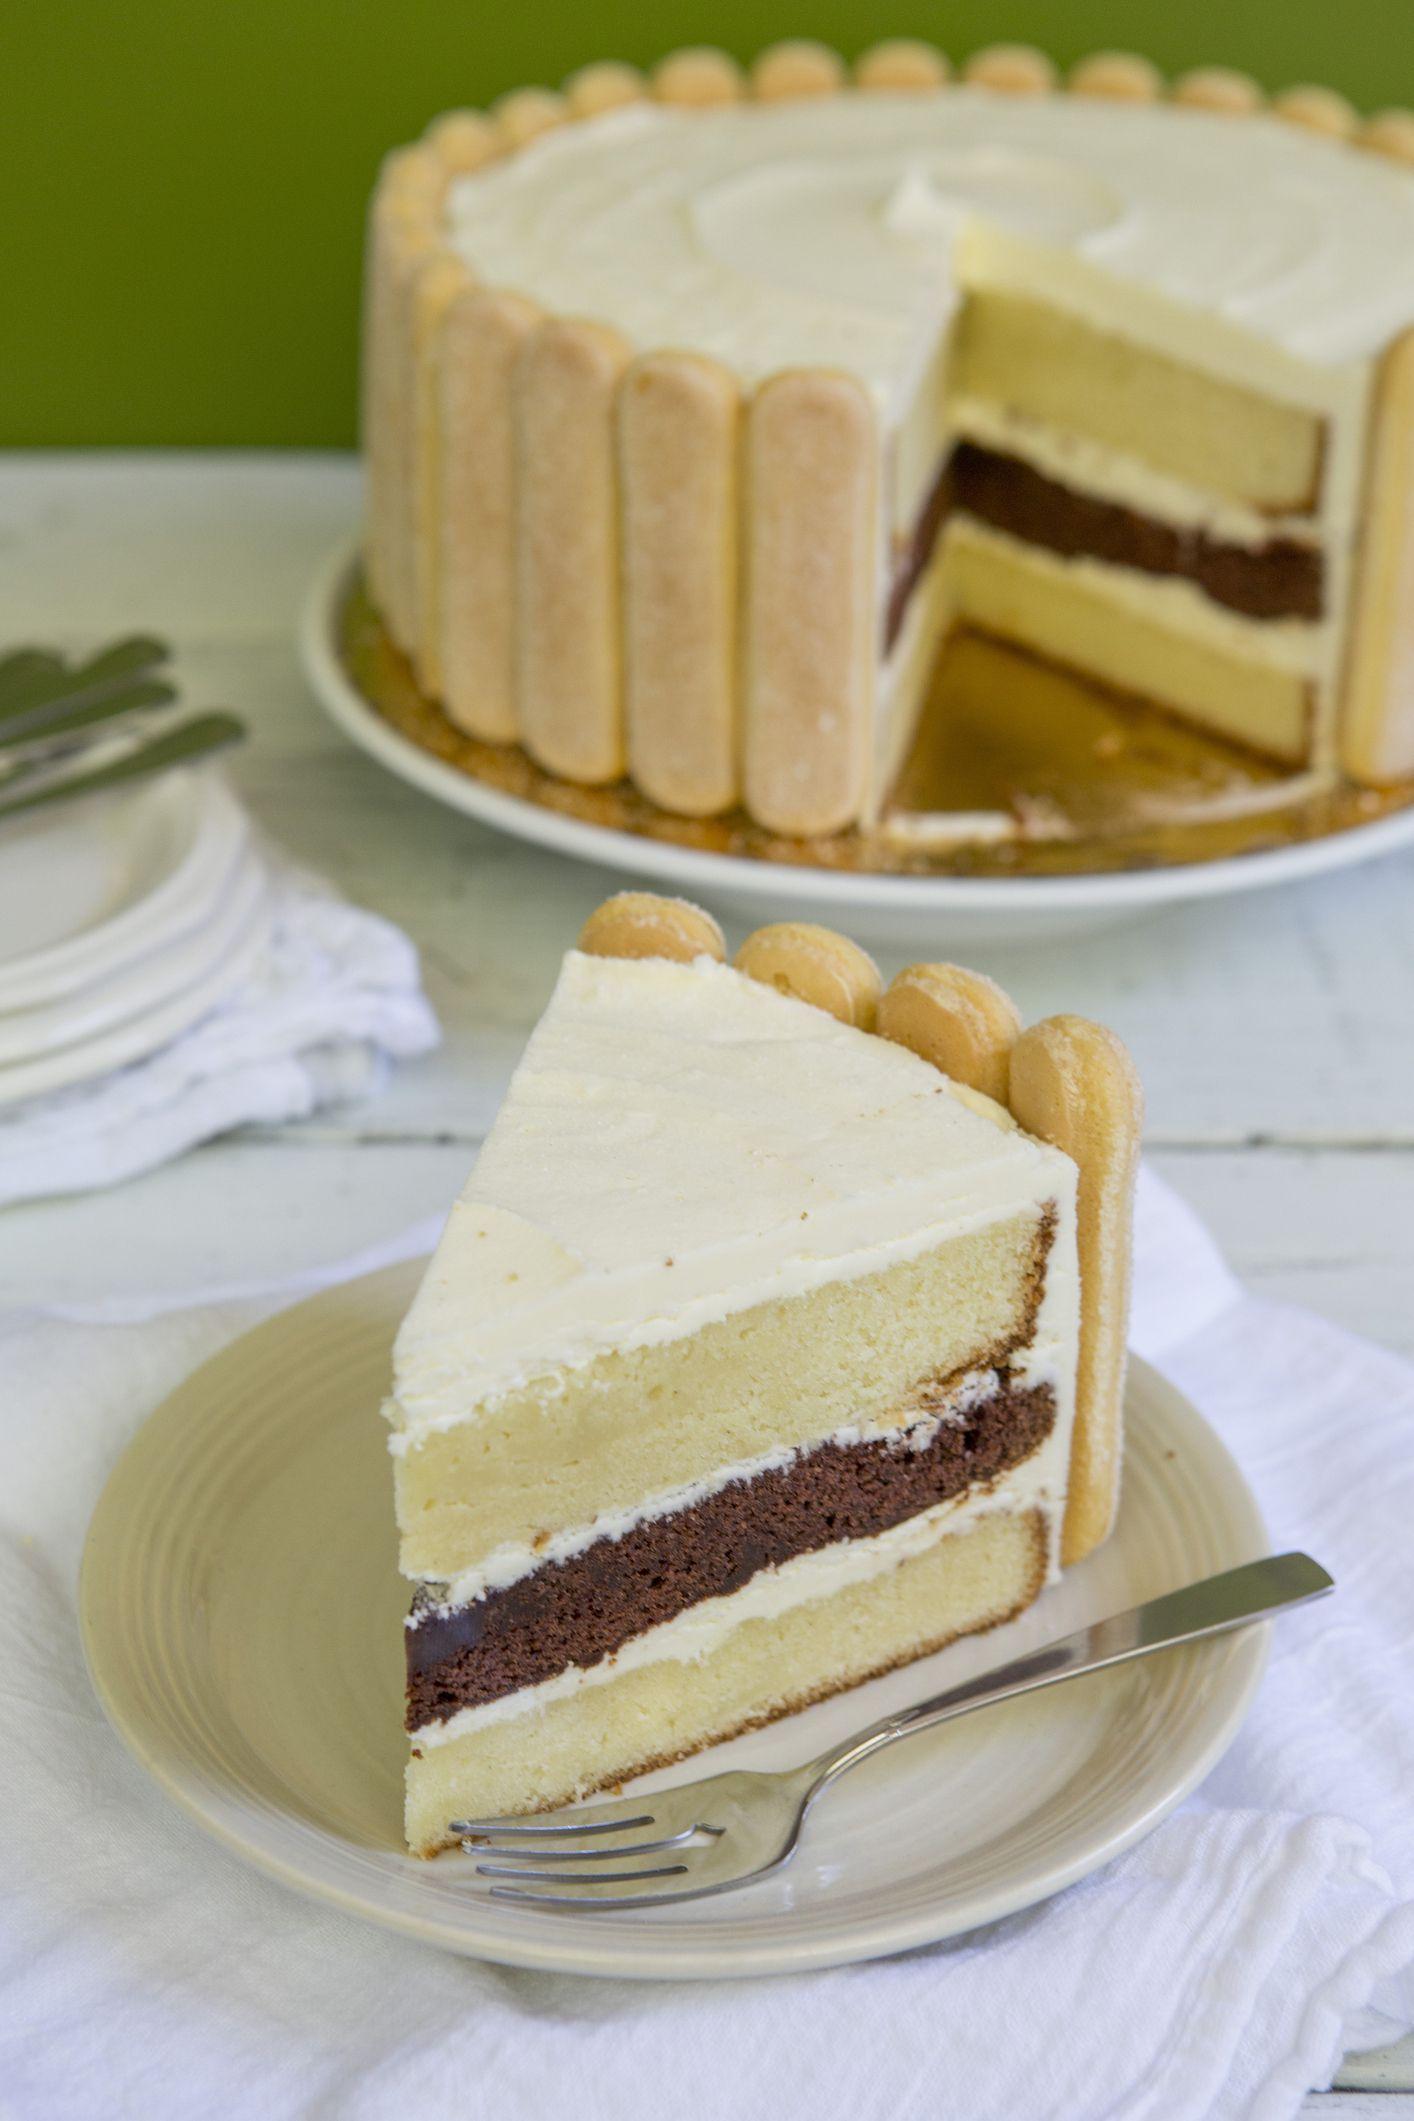 Classic French Dessert Charlotte Cake